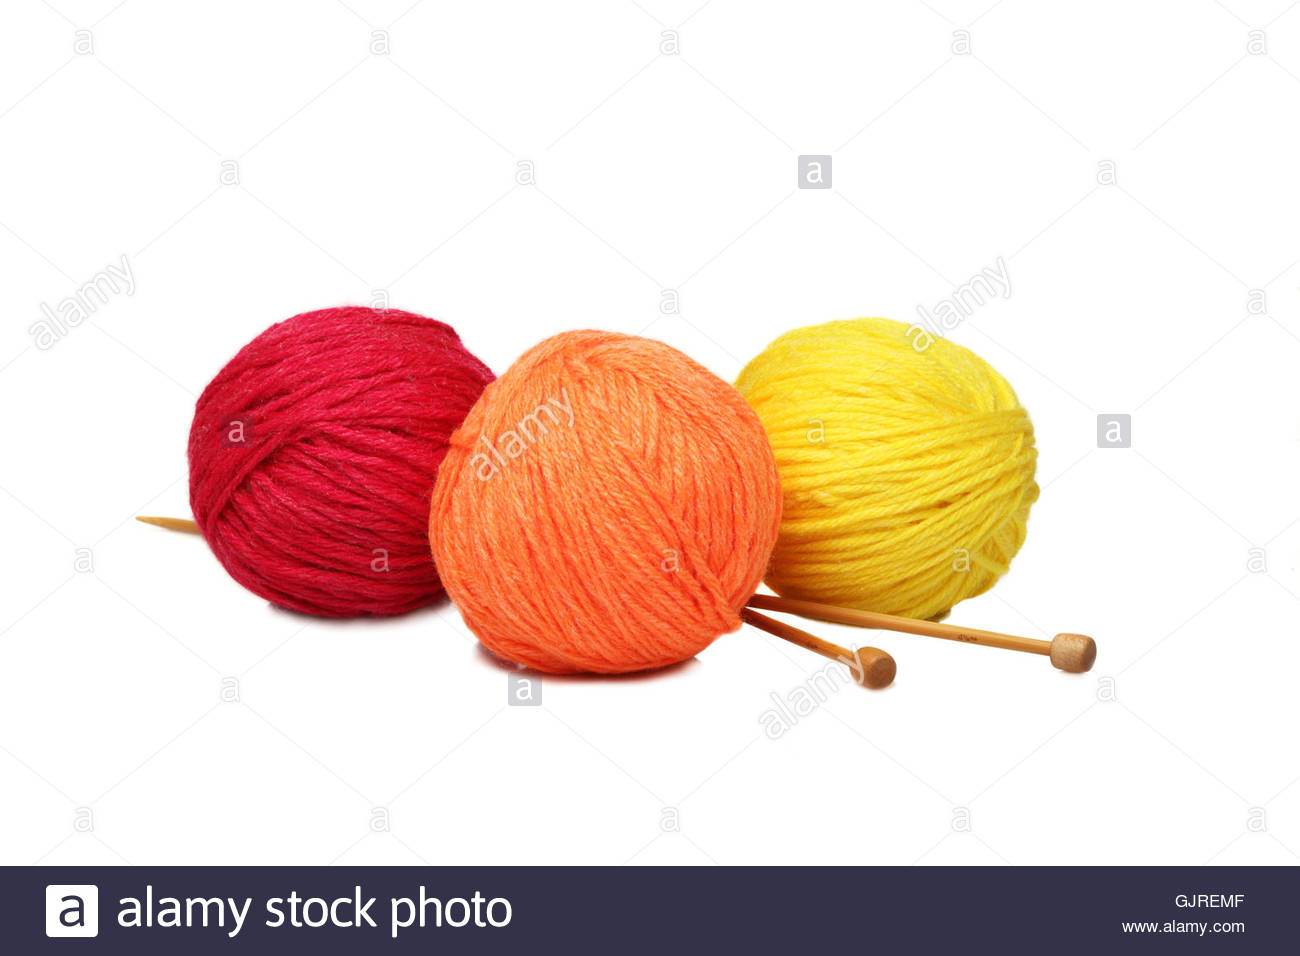 wool hobby needles - Stock Image